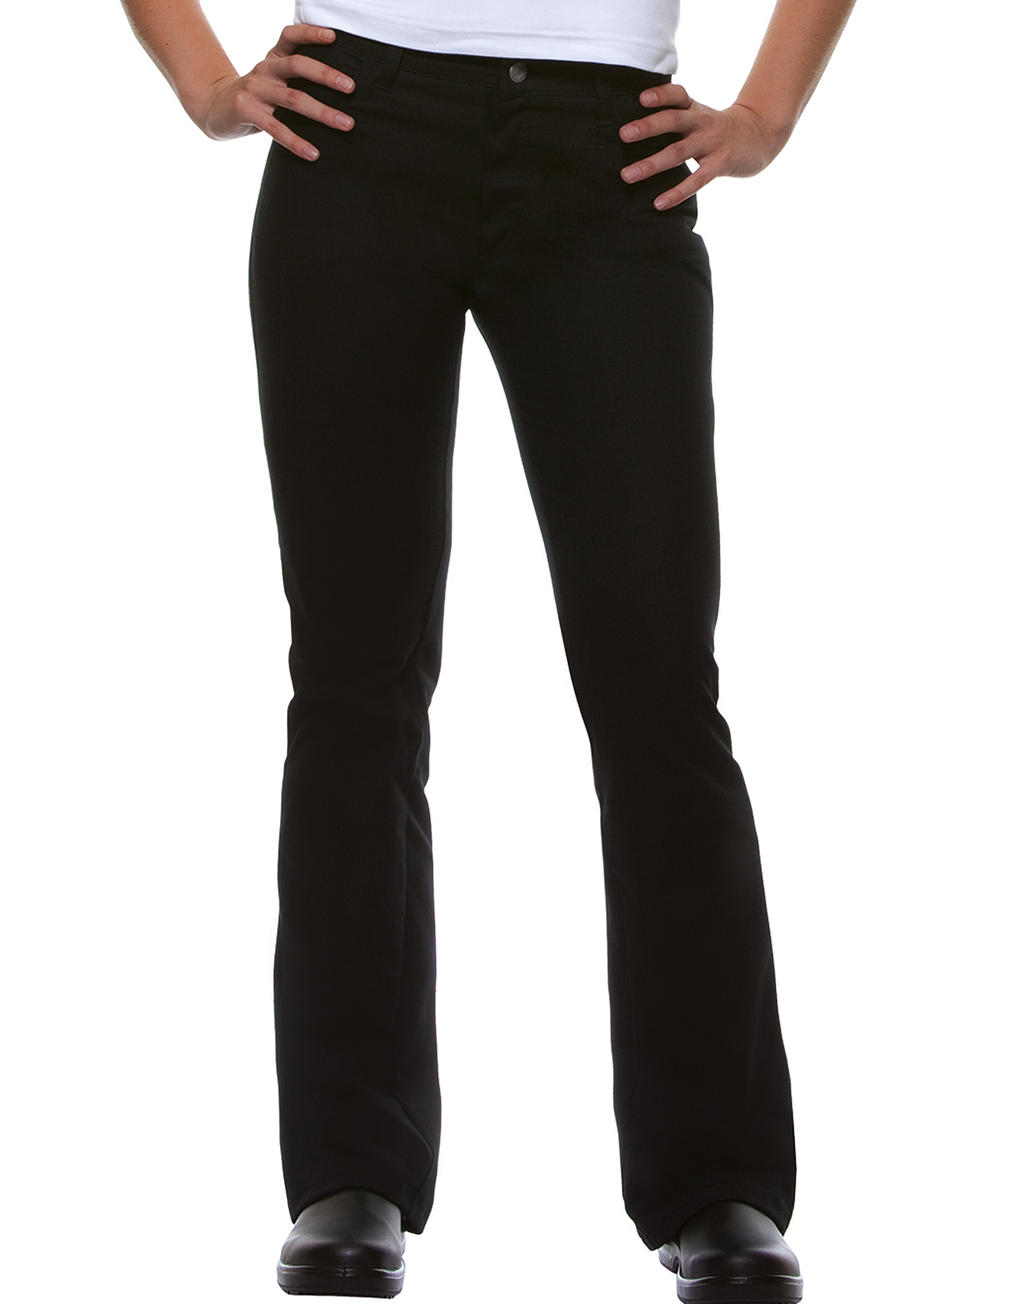 Dámské kalhoty Tina - zvìtšit obrázek